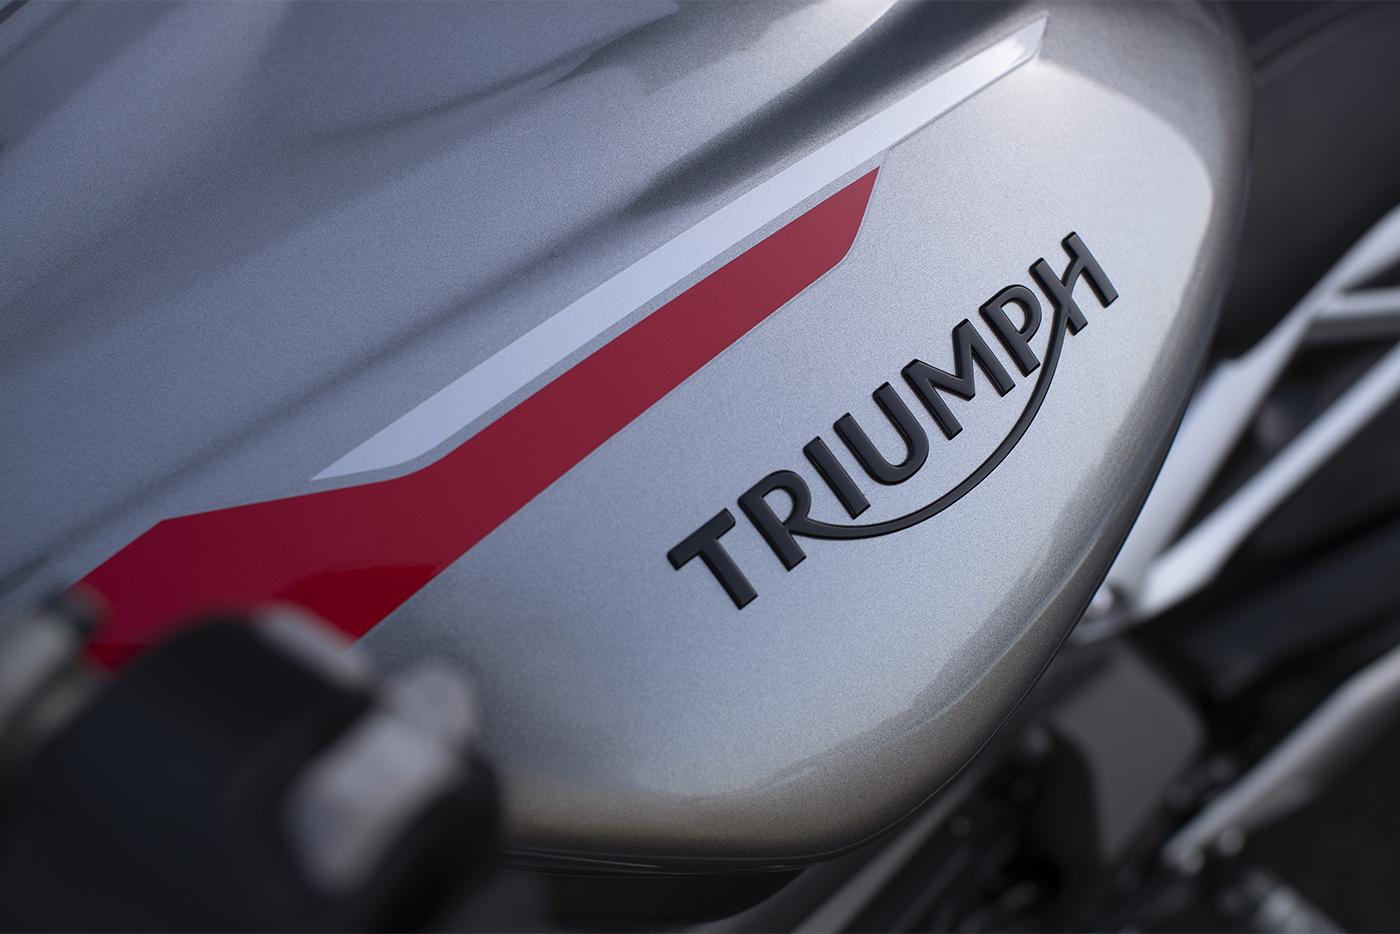 2020-triumph-street-triple-765rs-5.jpg